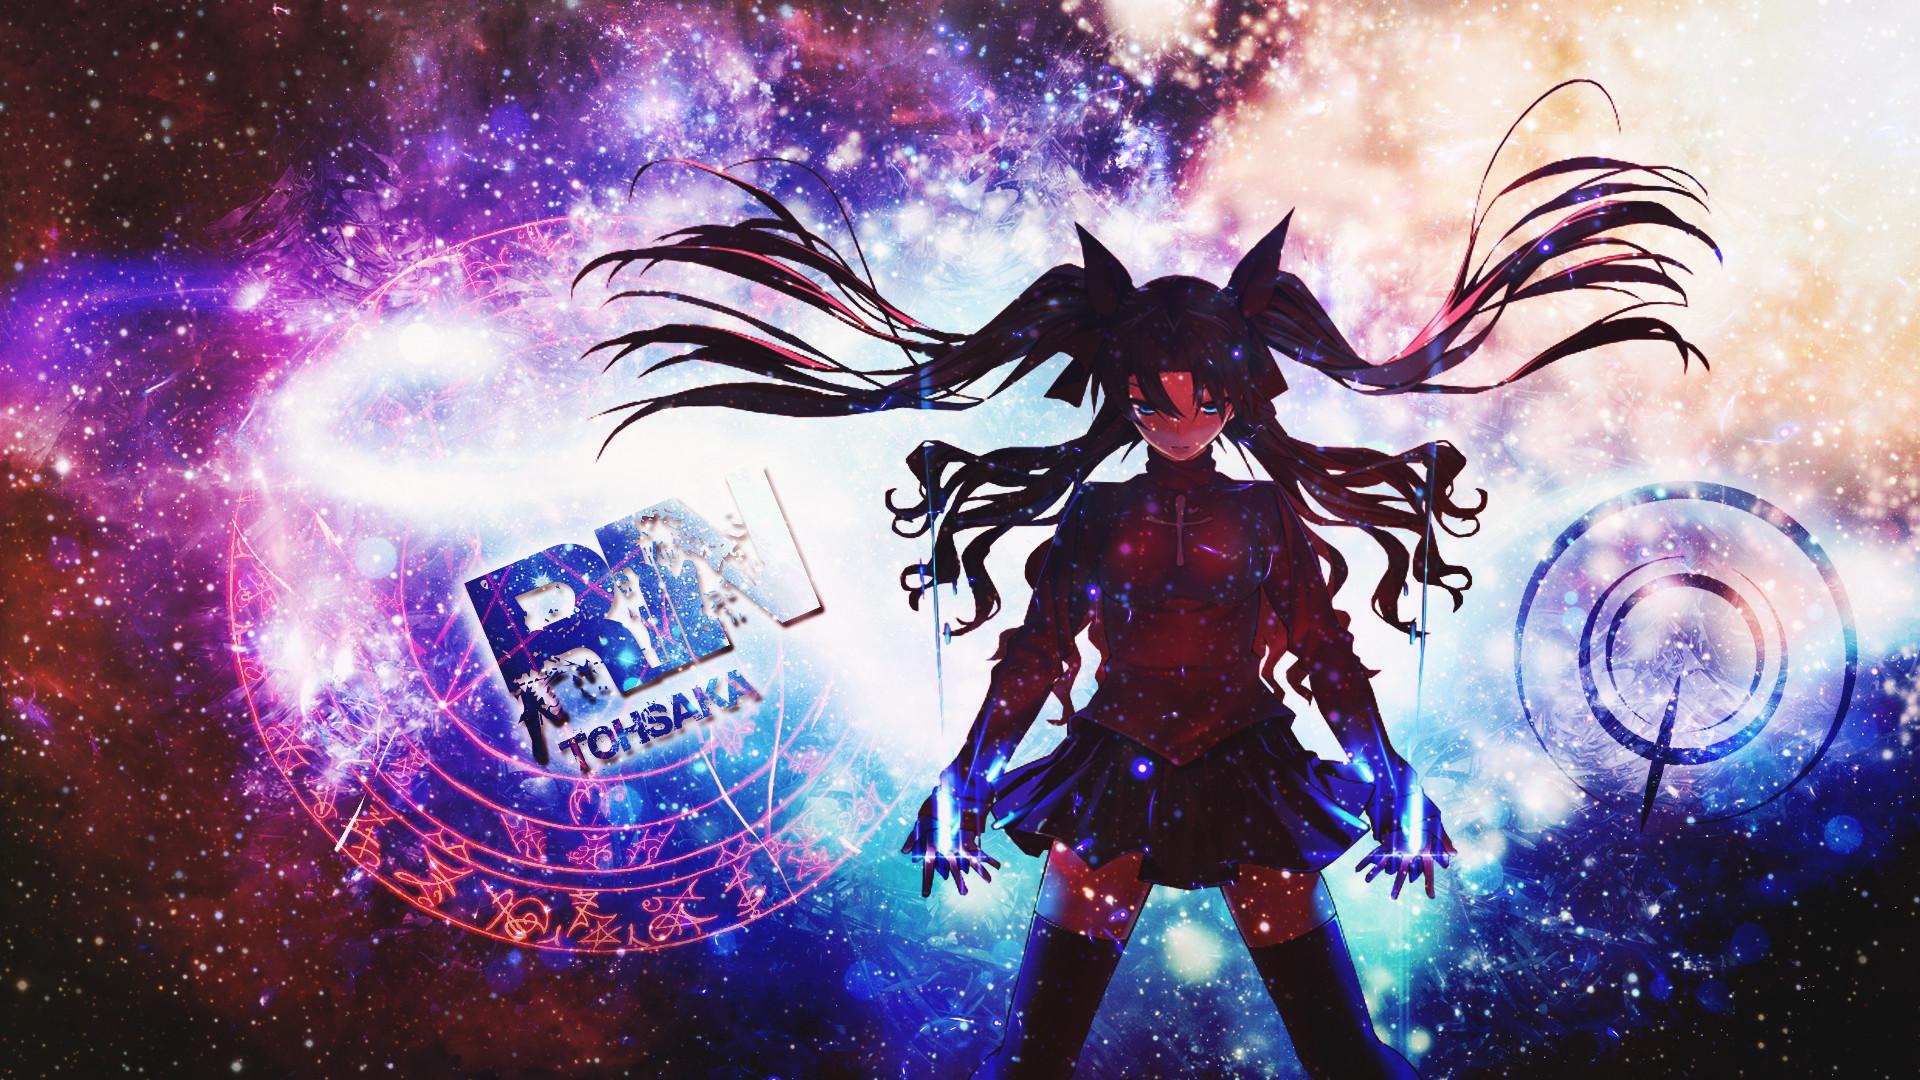 75 Fate Stay Night Wallpaper Hd